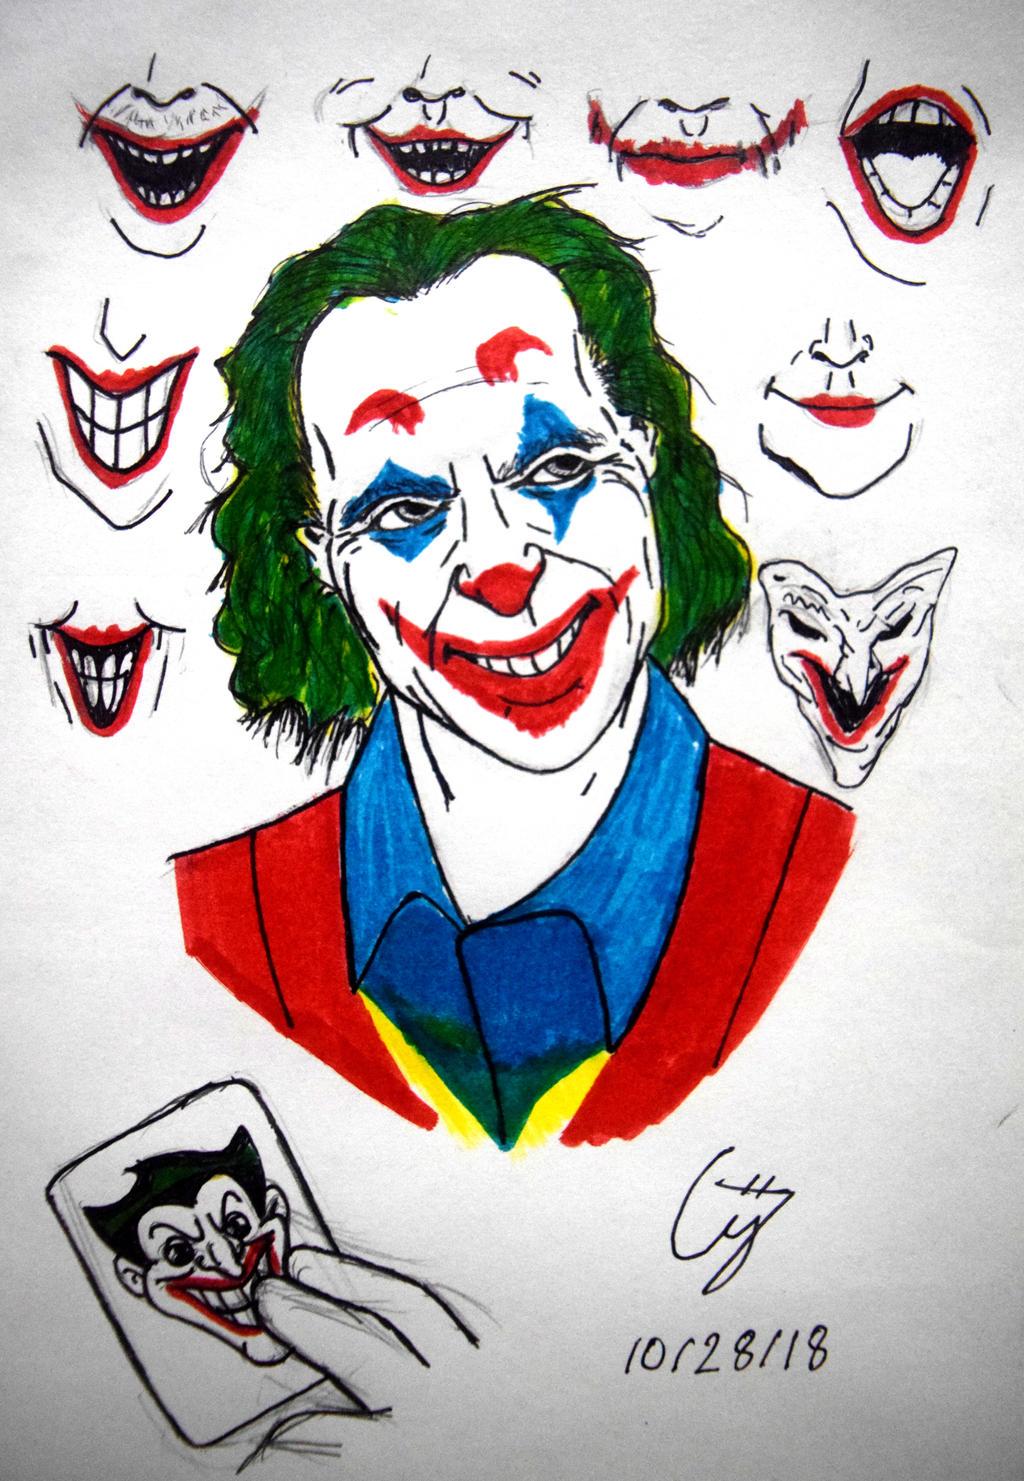 Inktober Drawings 26 Joaquin Phoenix Joker By Thekidster12